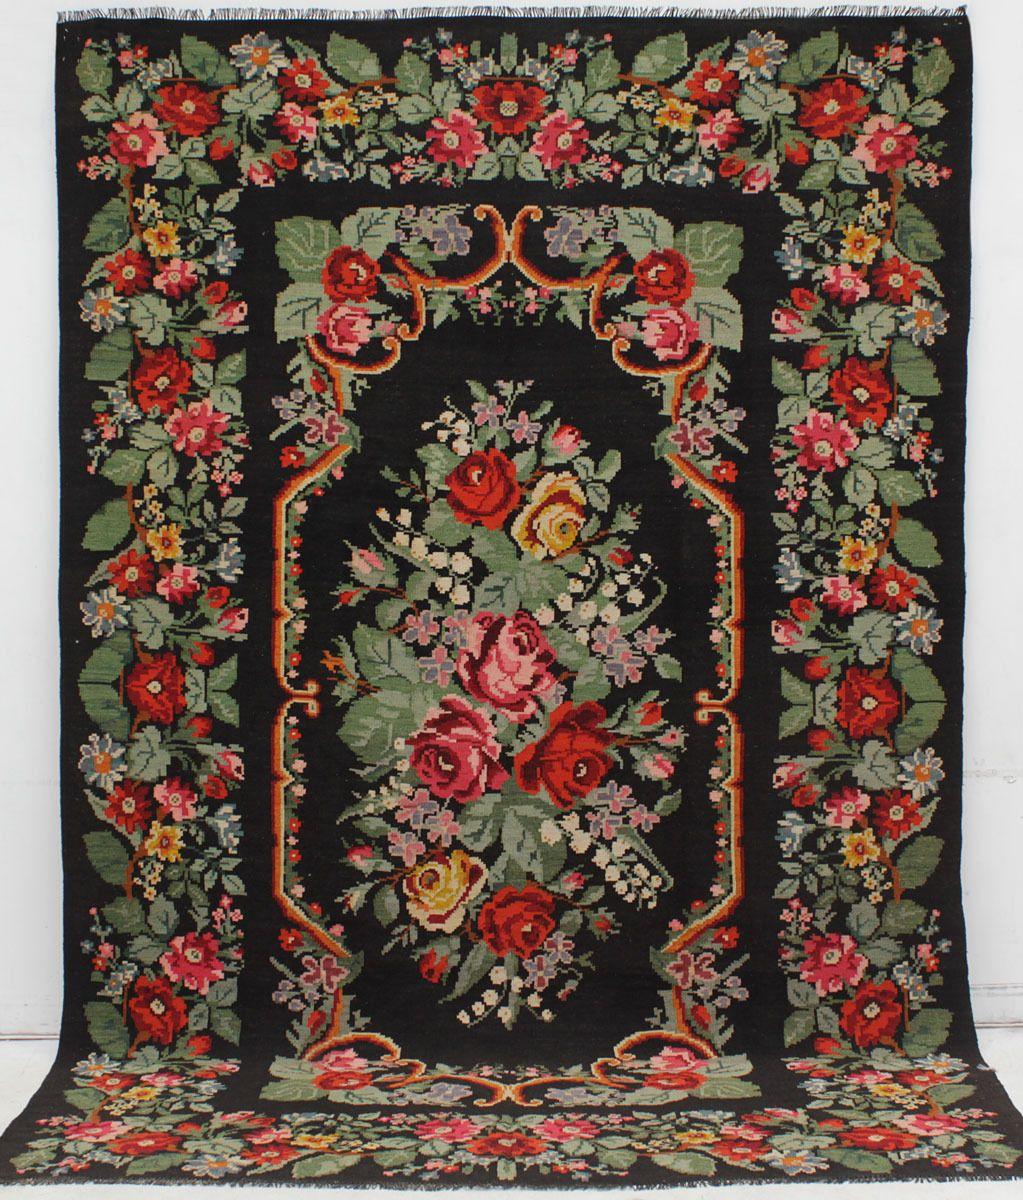 MATTA, Orientalisk, Moldavisk Kelim, 366 x 246 cm. Auktion